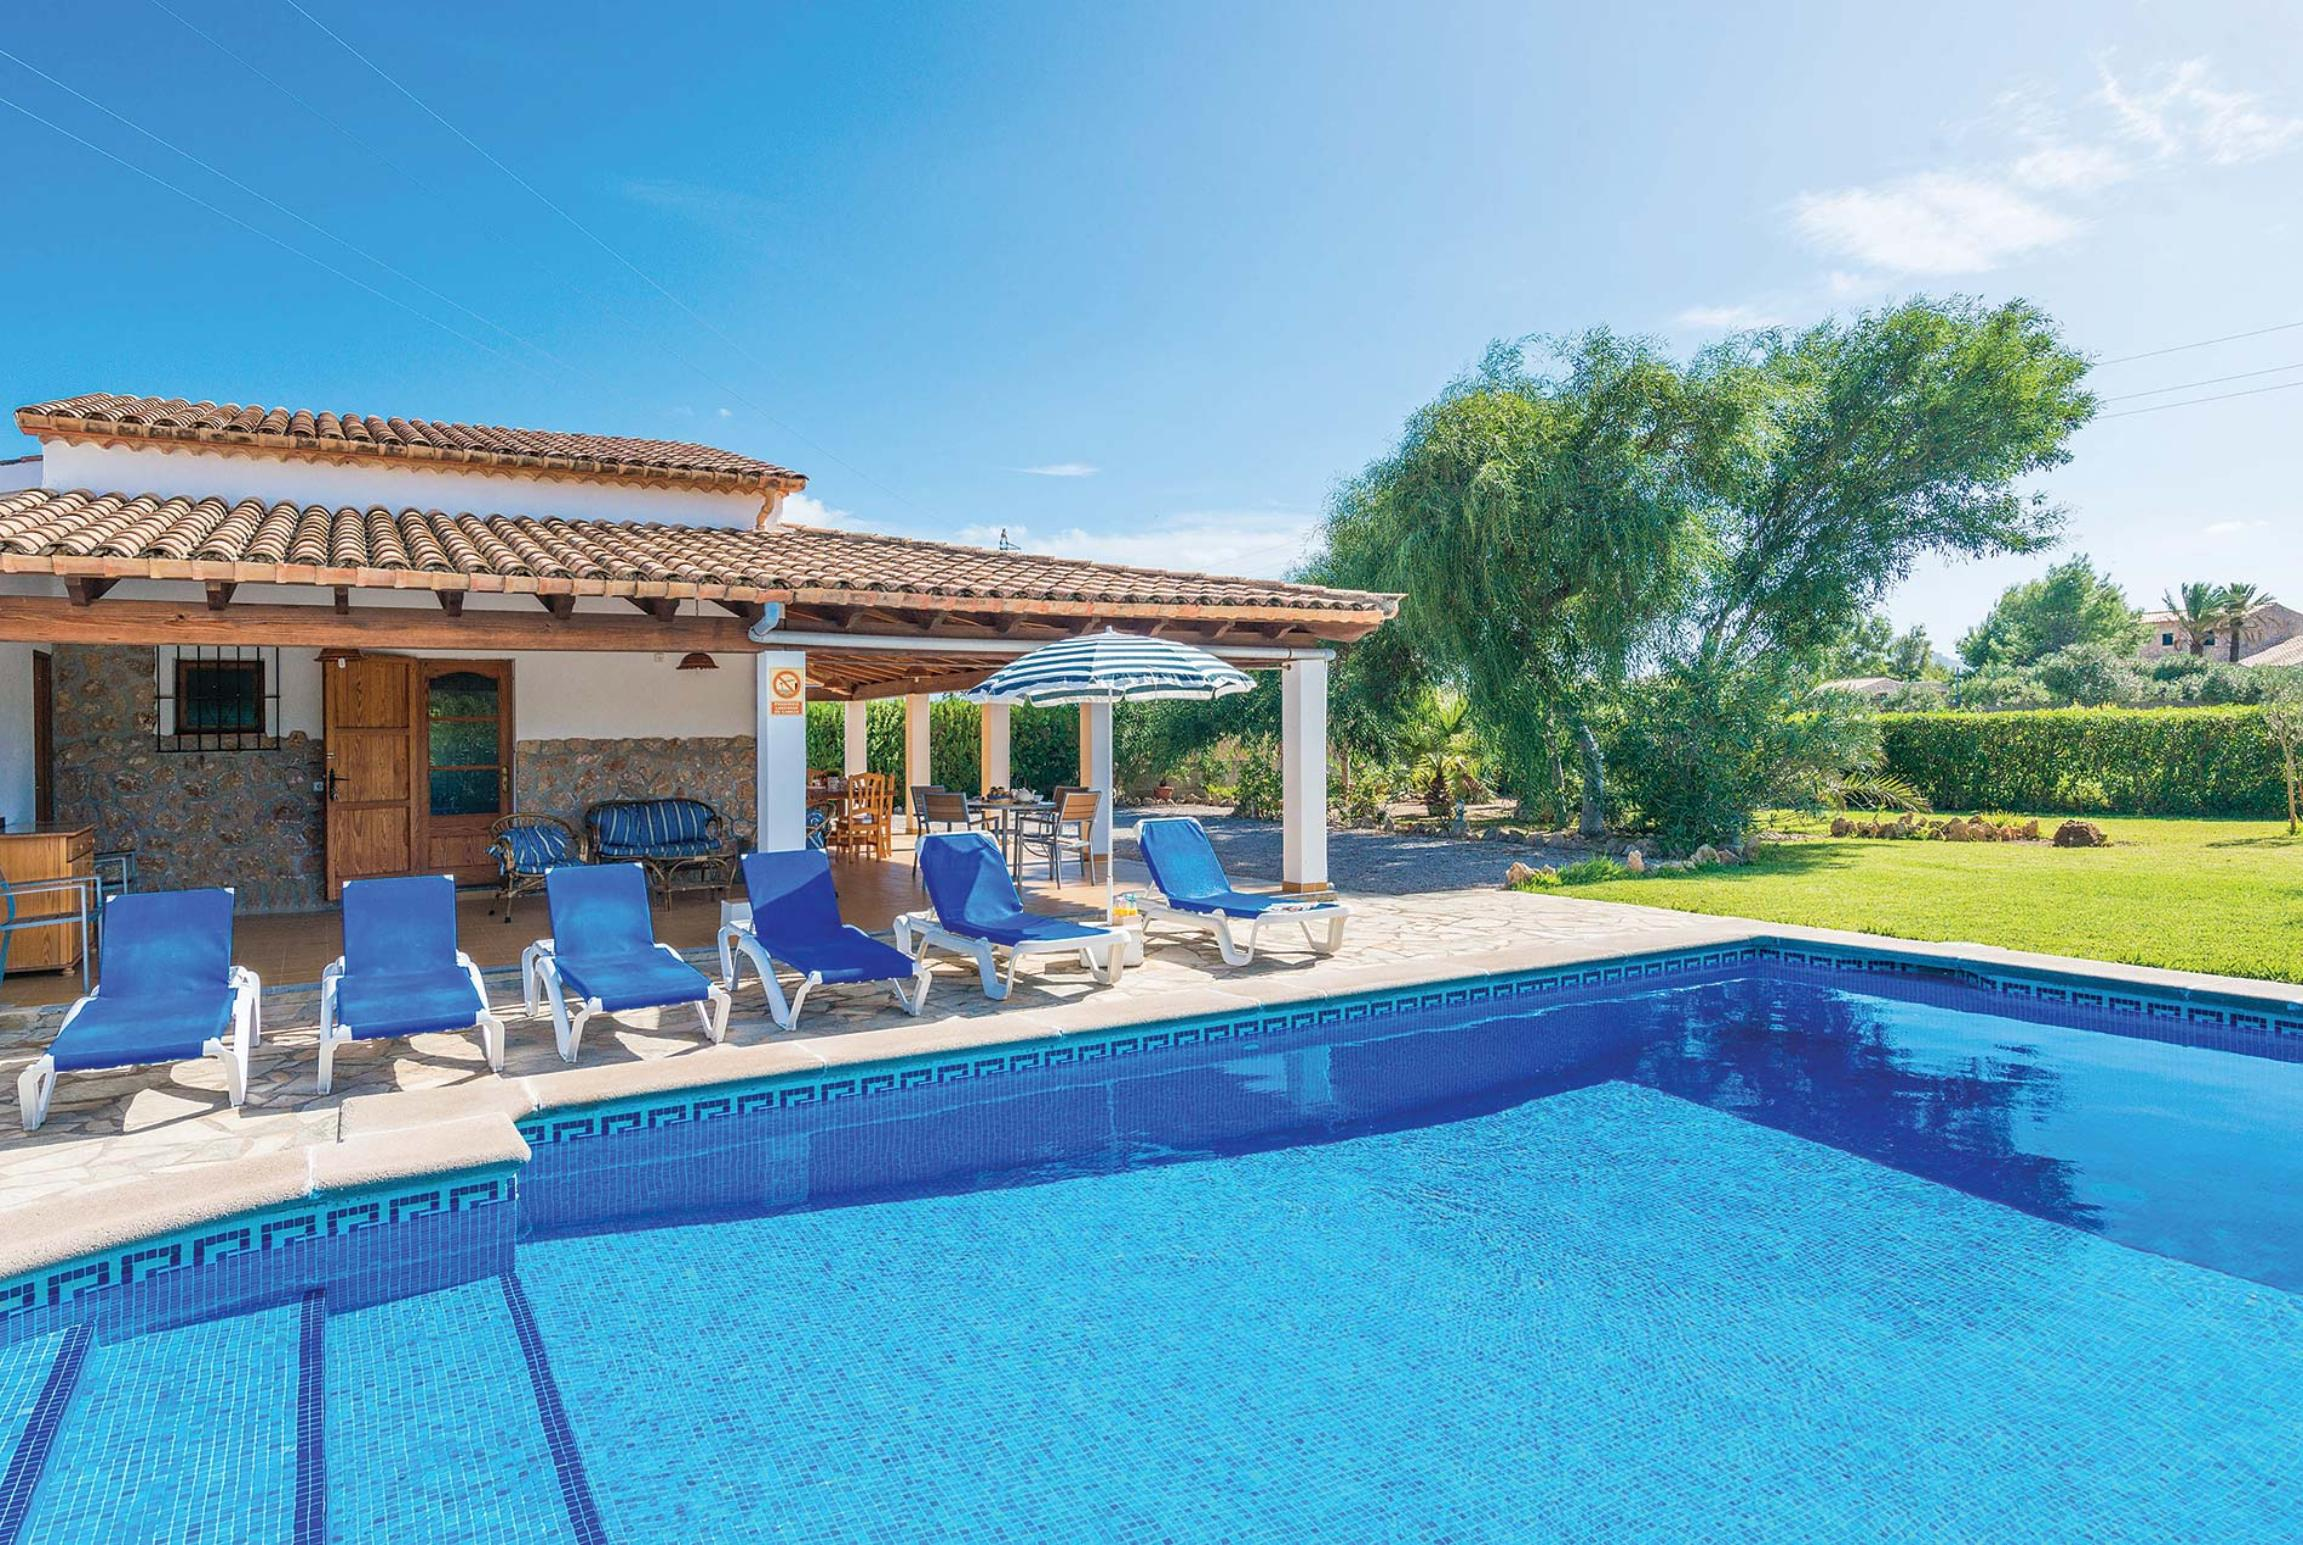 Ferienhaus Rasca (2654350), Formentor, Mallorca, Balearische Inseln, Spanien, Bild 14